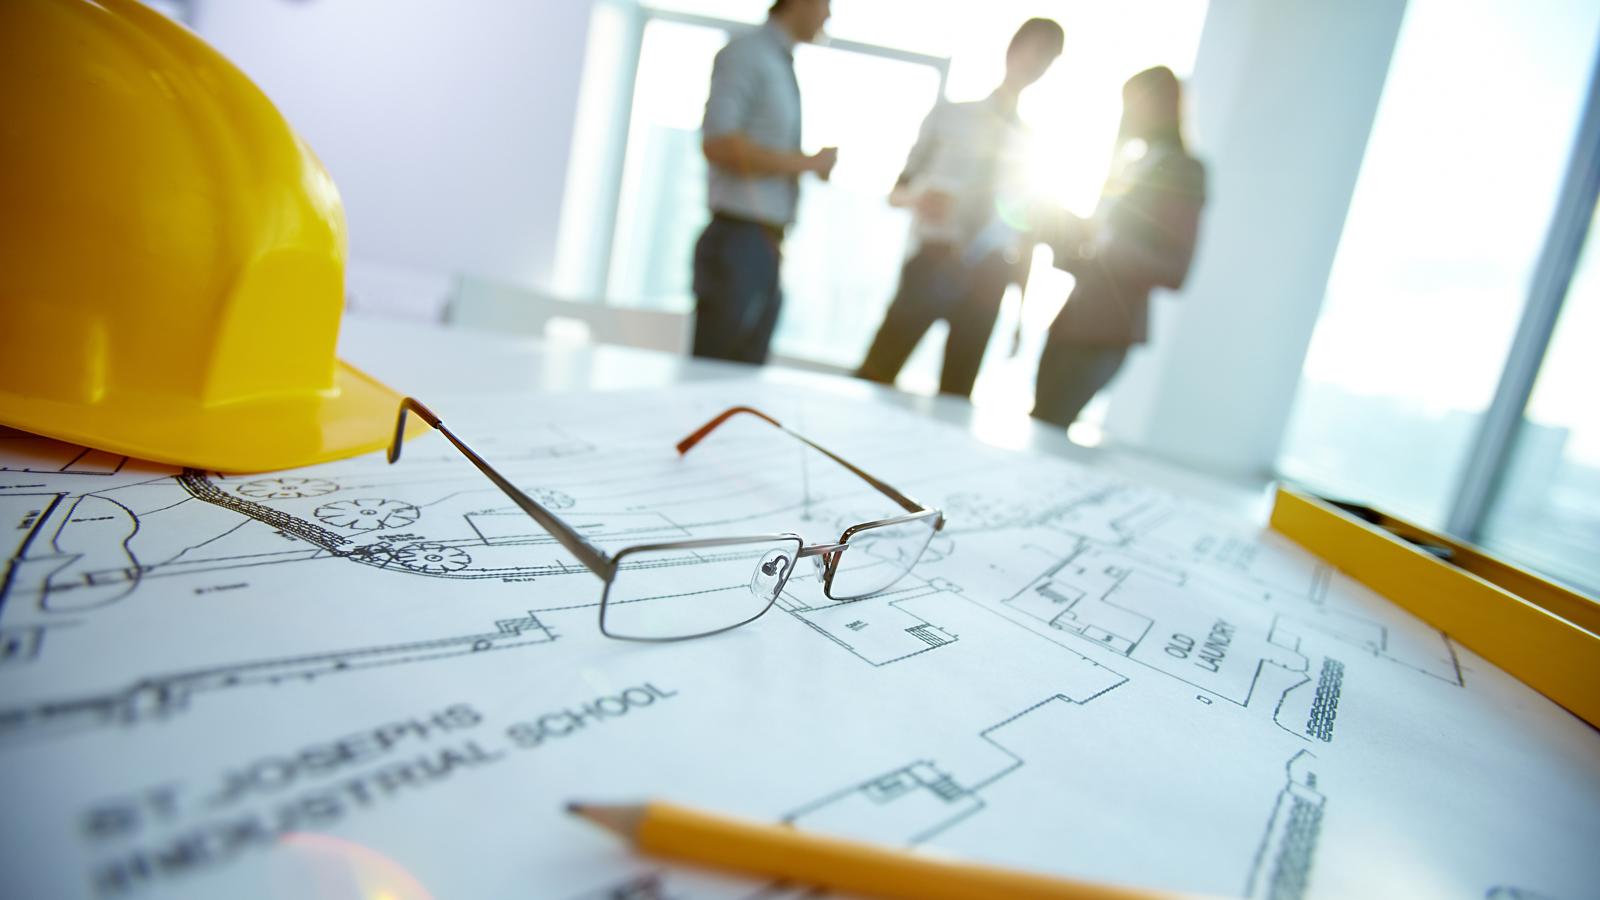 Employees discuss blueprints